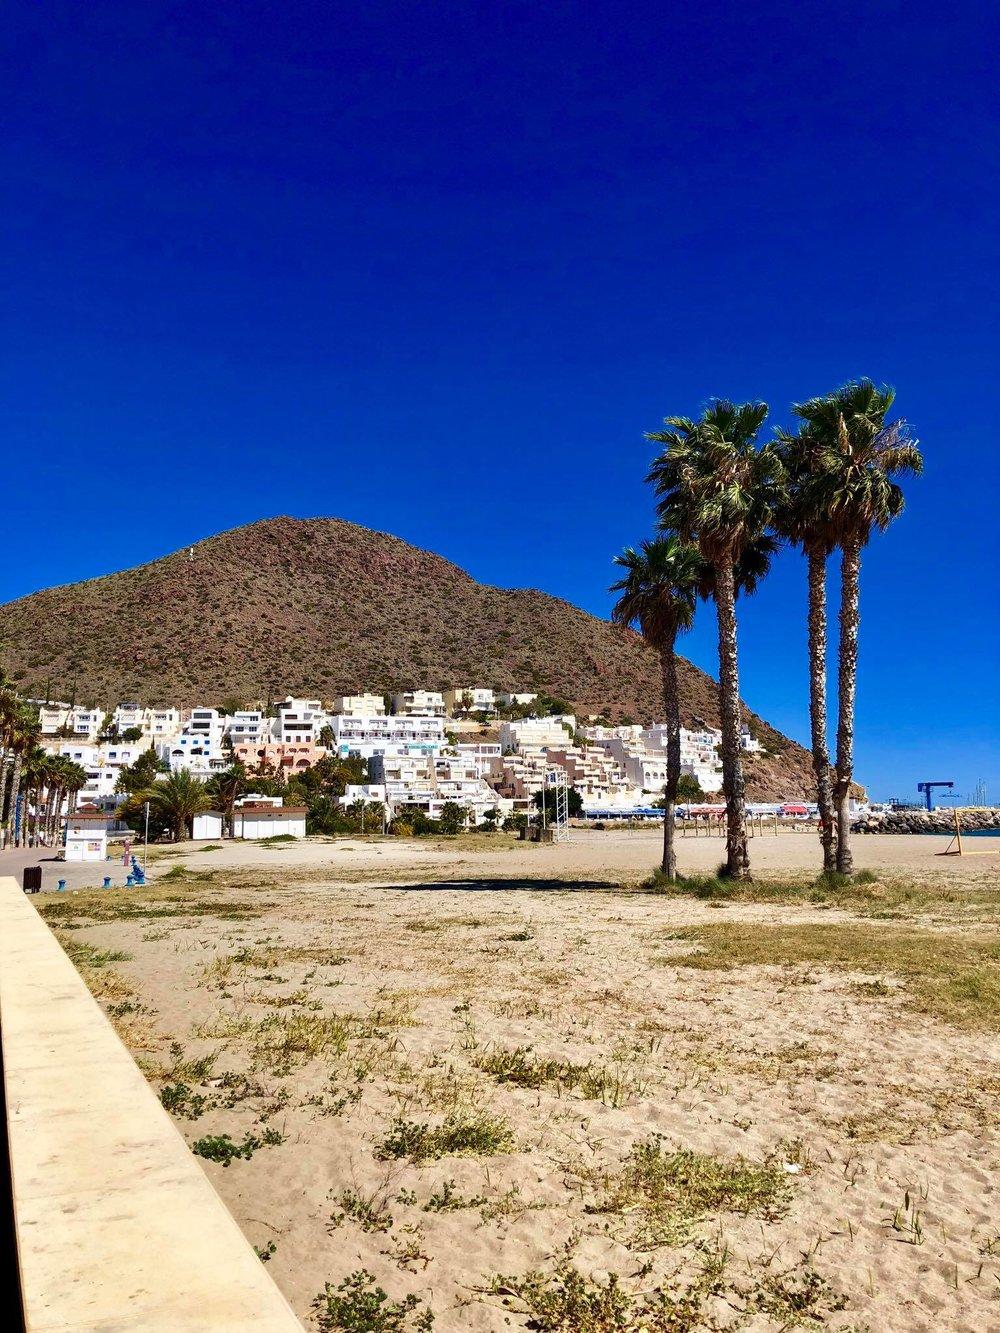 Kach Solo Travels in 2019 Spain you're so beautiful11.jpg